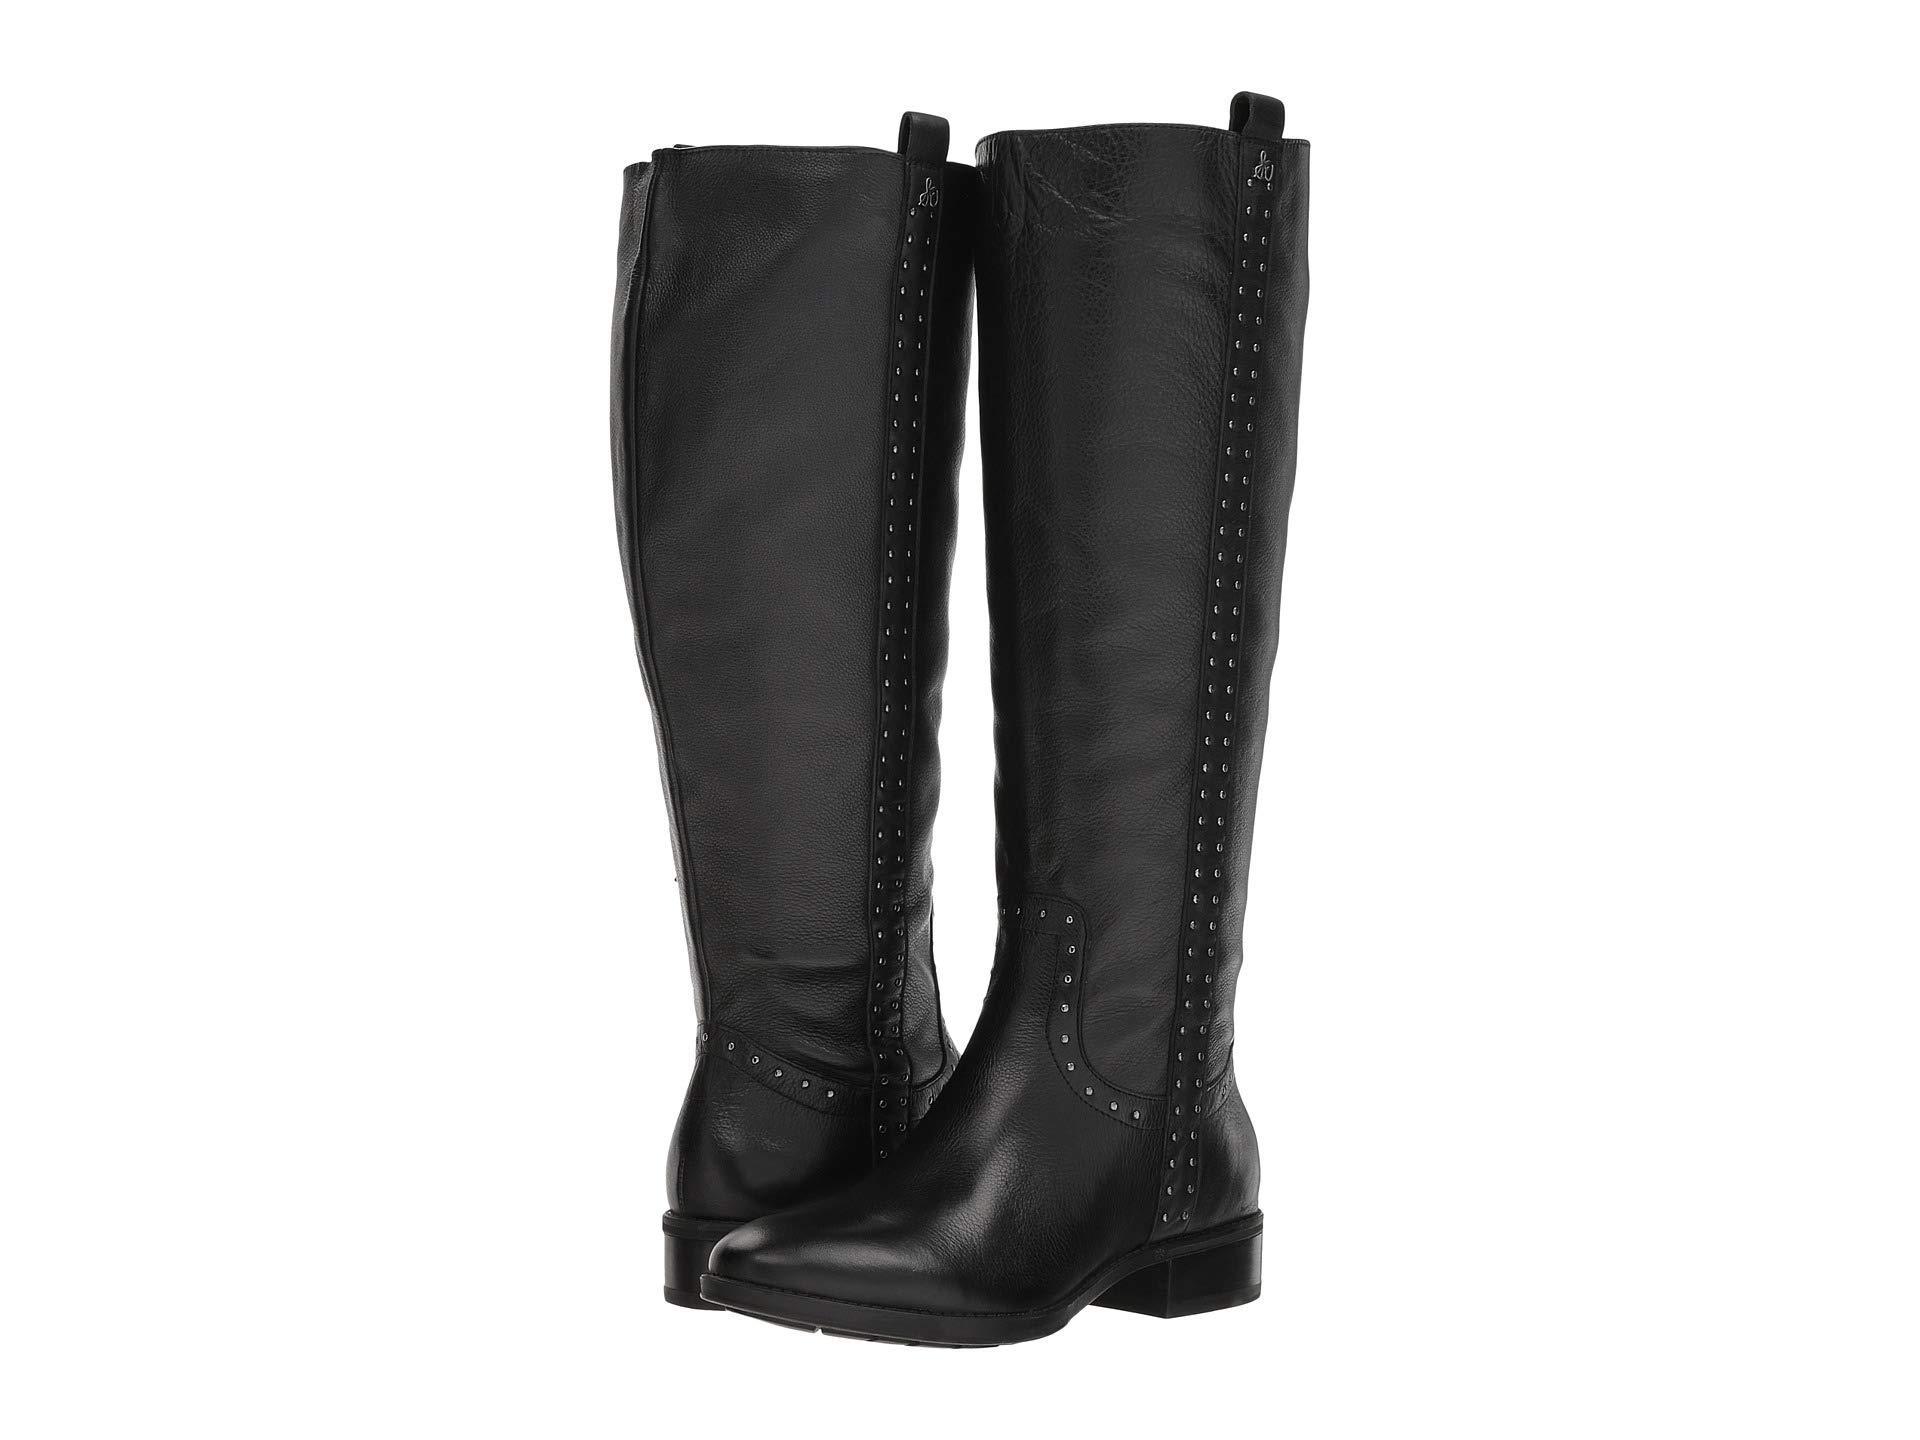 0ecfd9dfd597 Lyst - Sam Edelman Prina Wide Calf Leather Tall Boot in Black